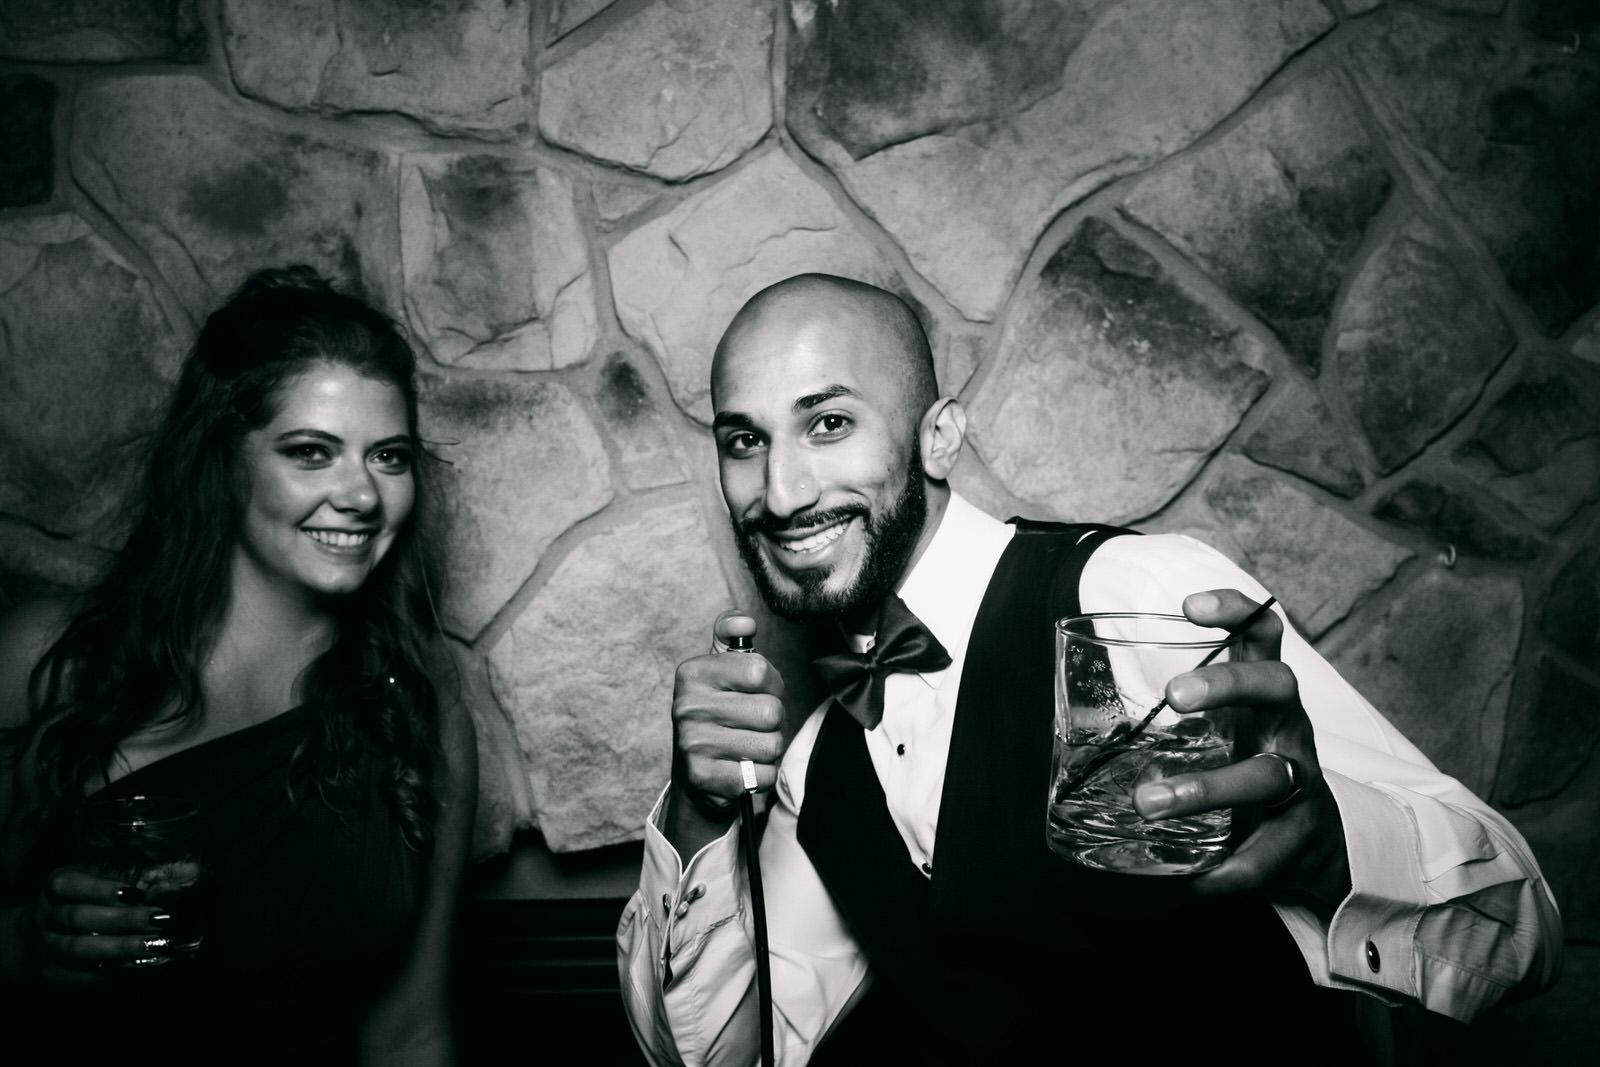 Jeanine-Sean-Wedding-Photo-Booth-17.jpg